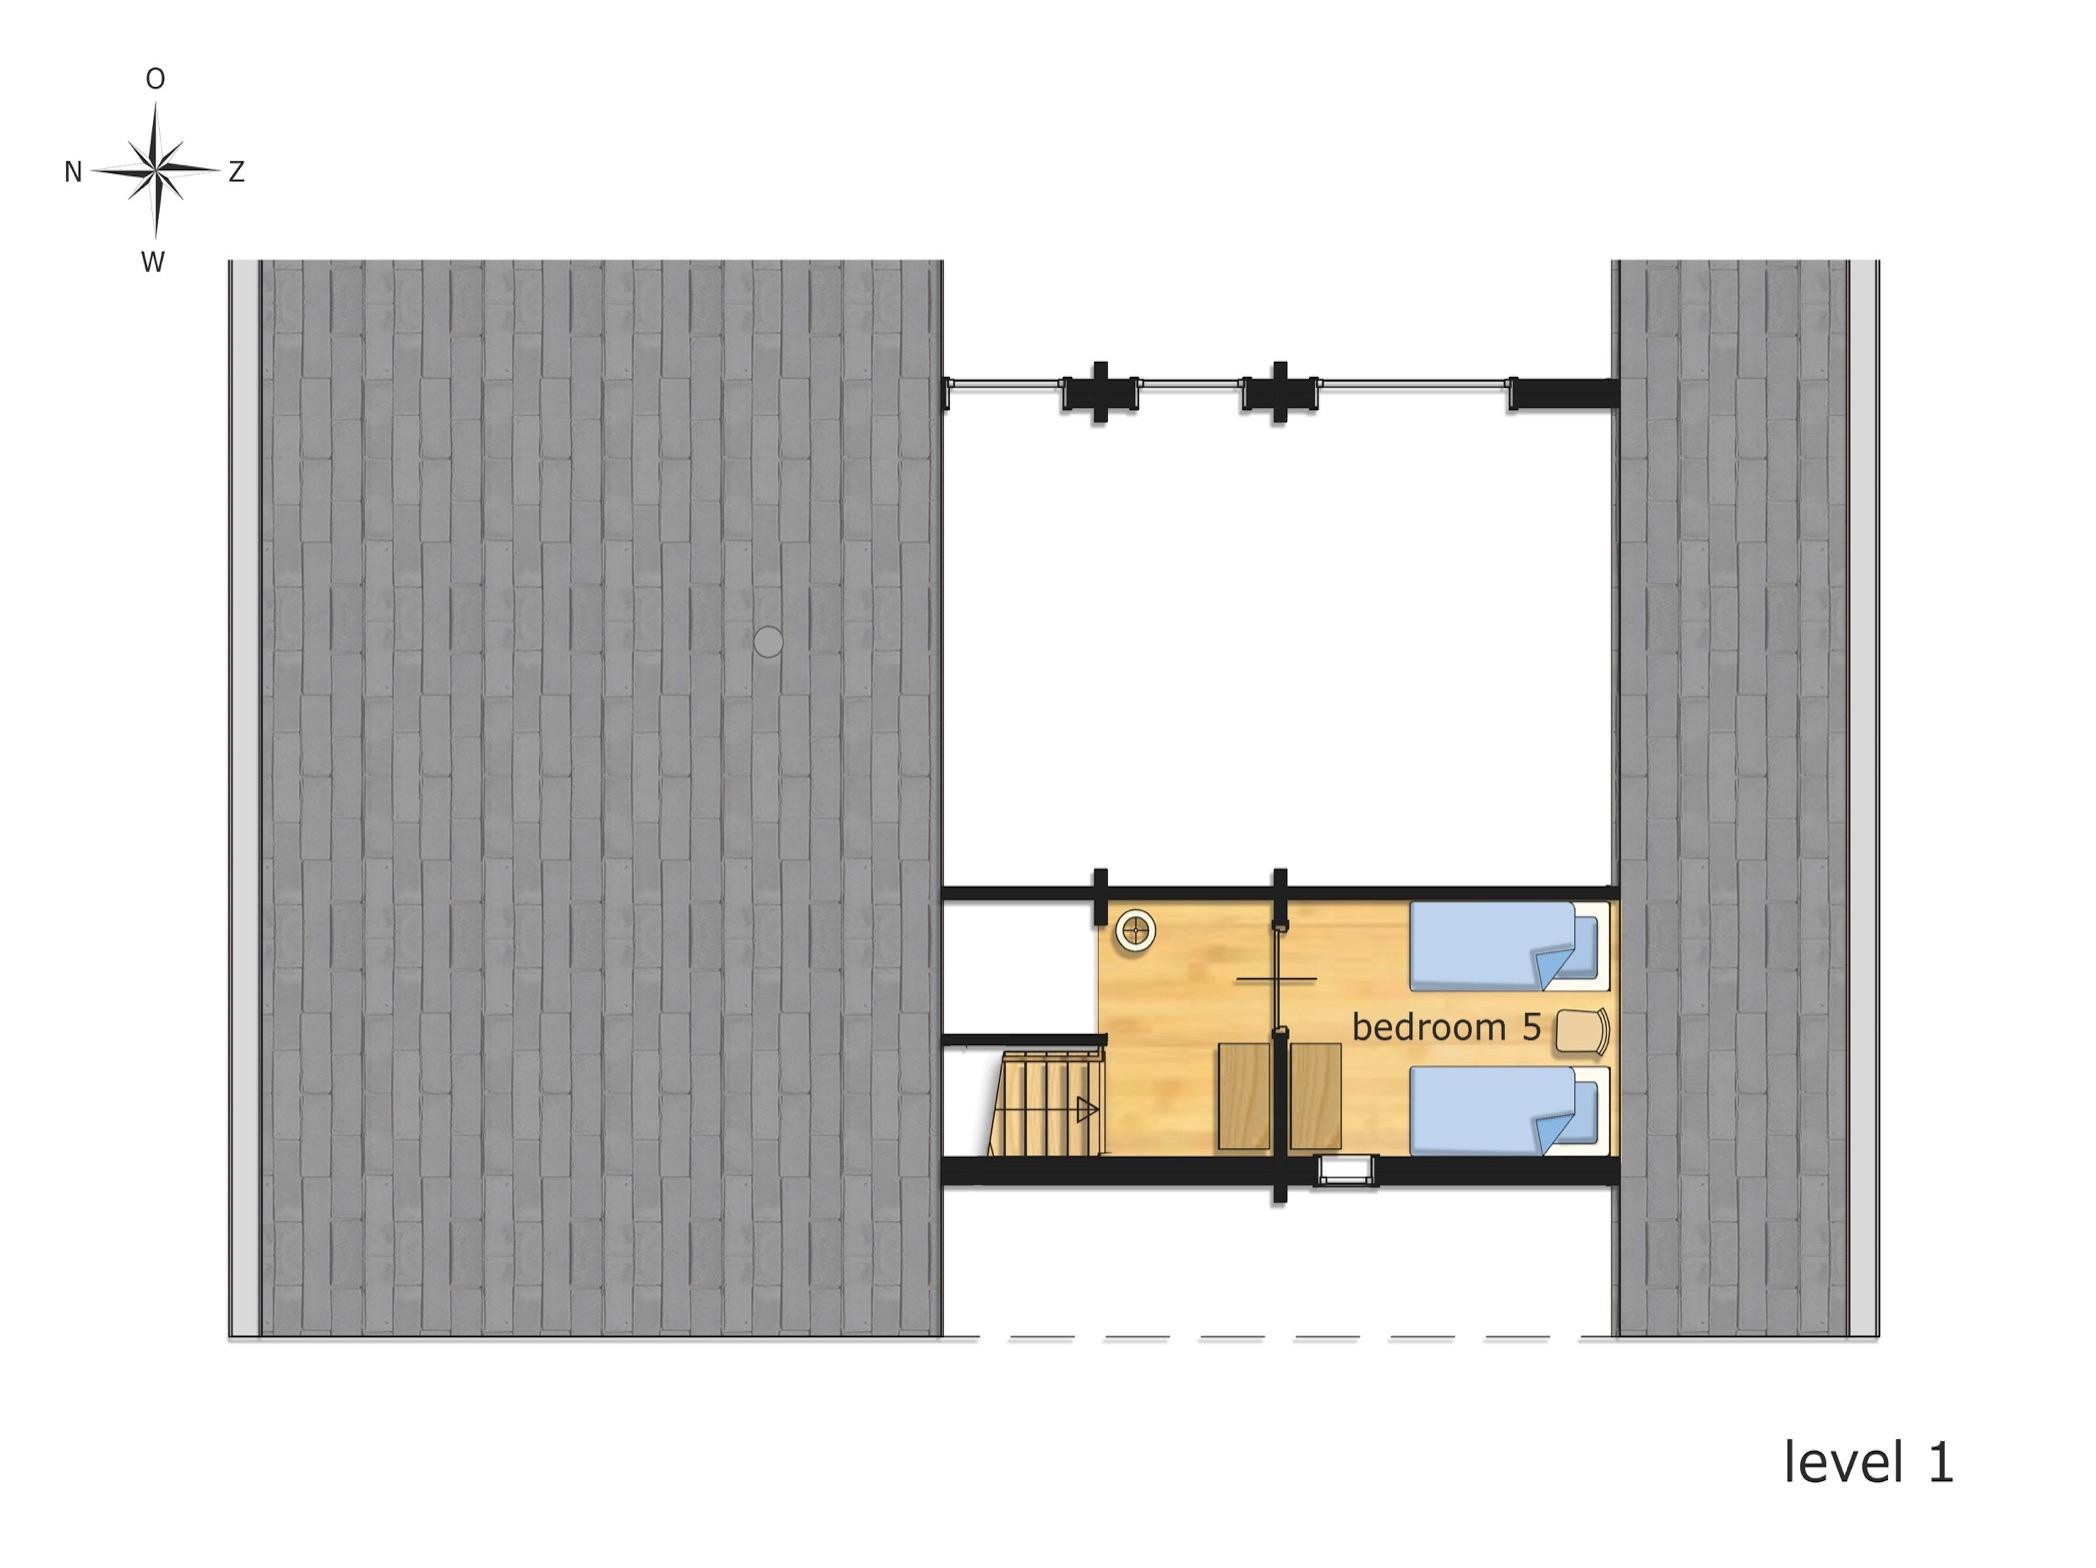 Holiday Home Floor Plan: level +1 (attic bedroom).